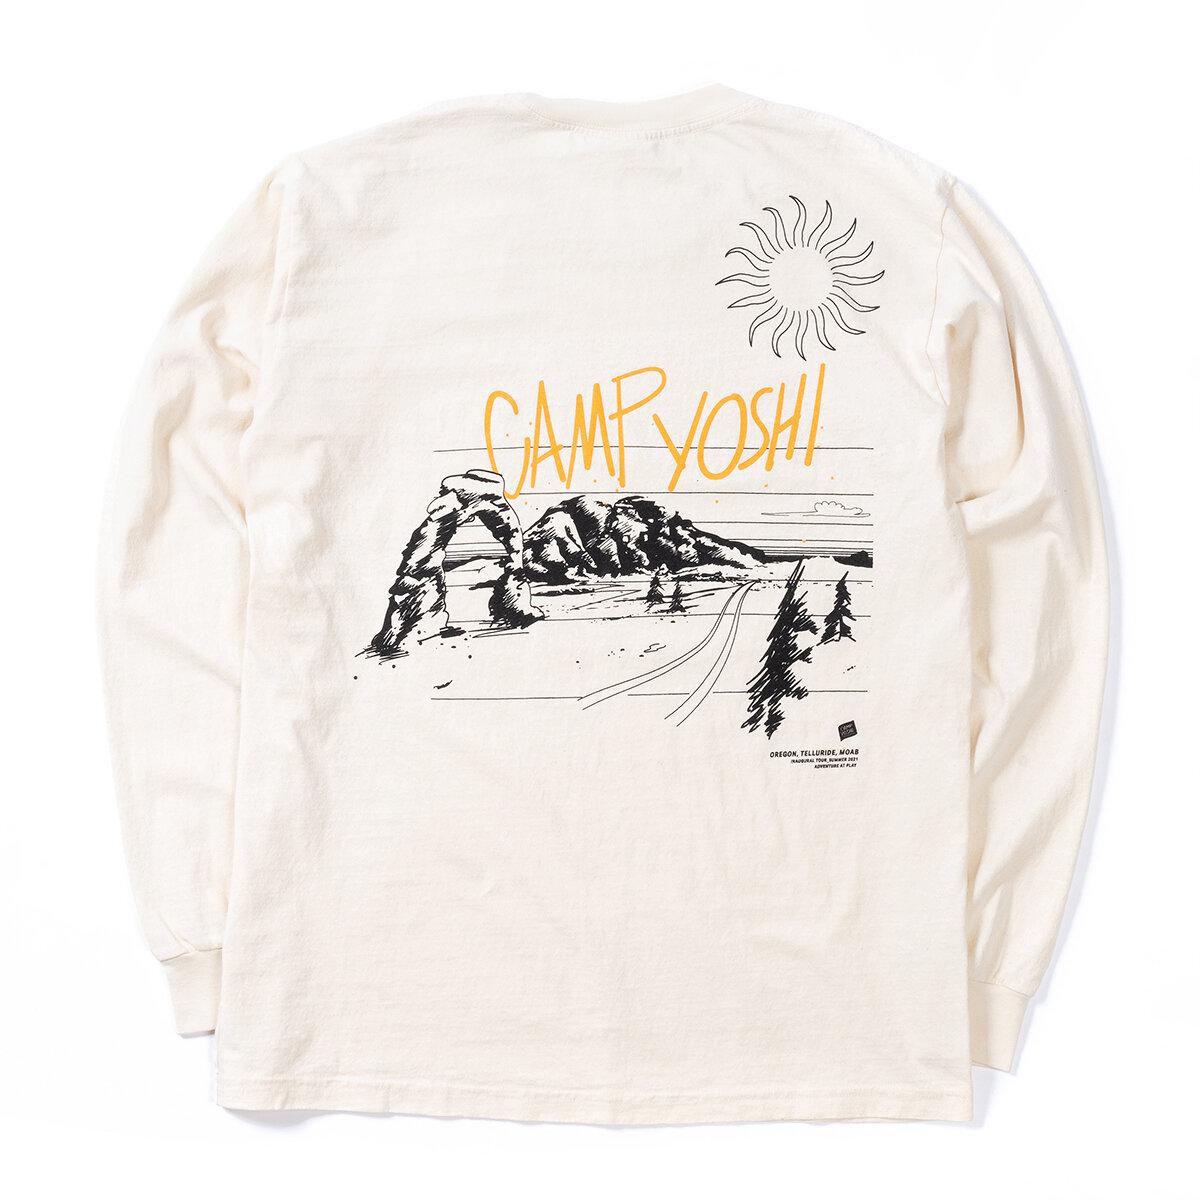 Camp-Yoshi-Shirt-Bak.jpeg